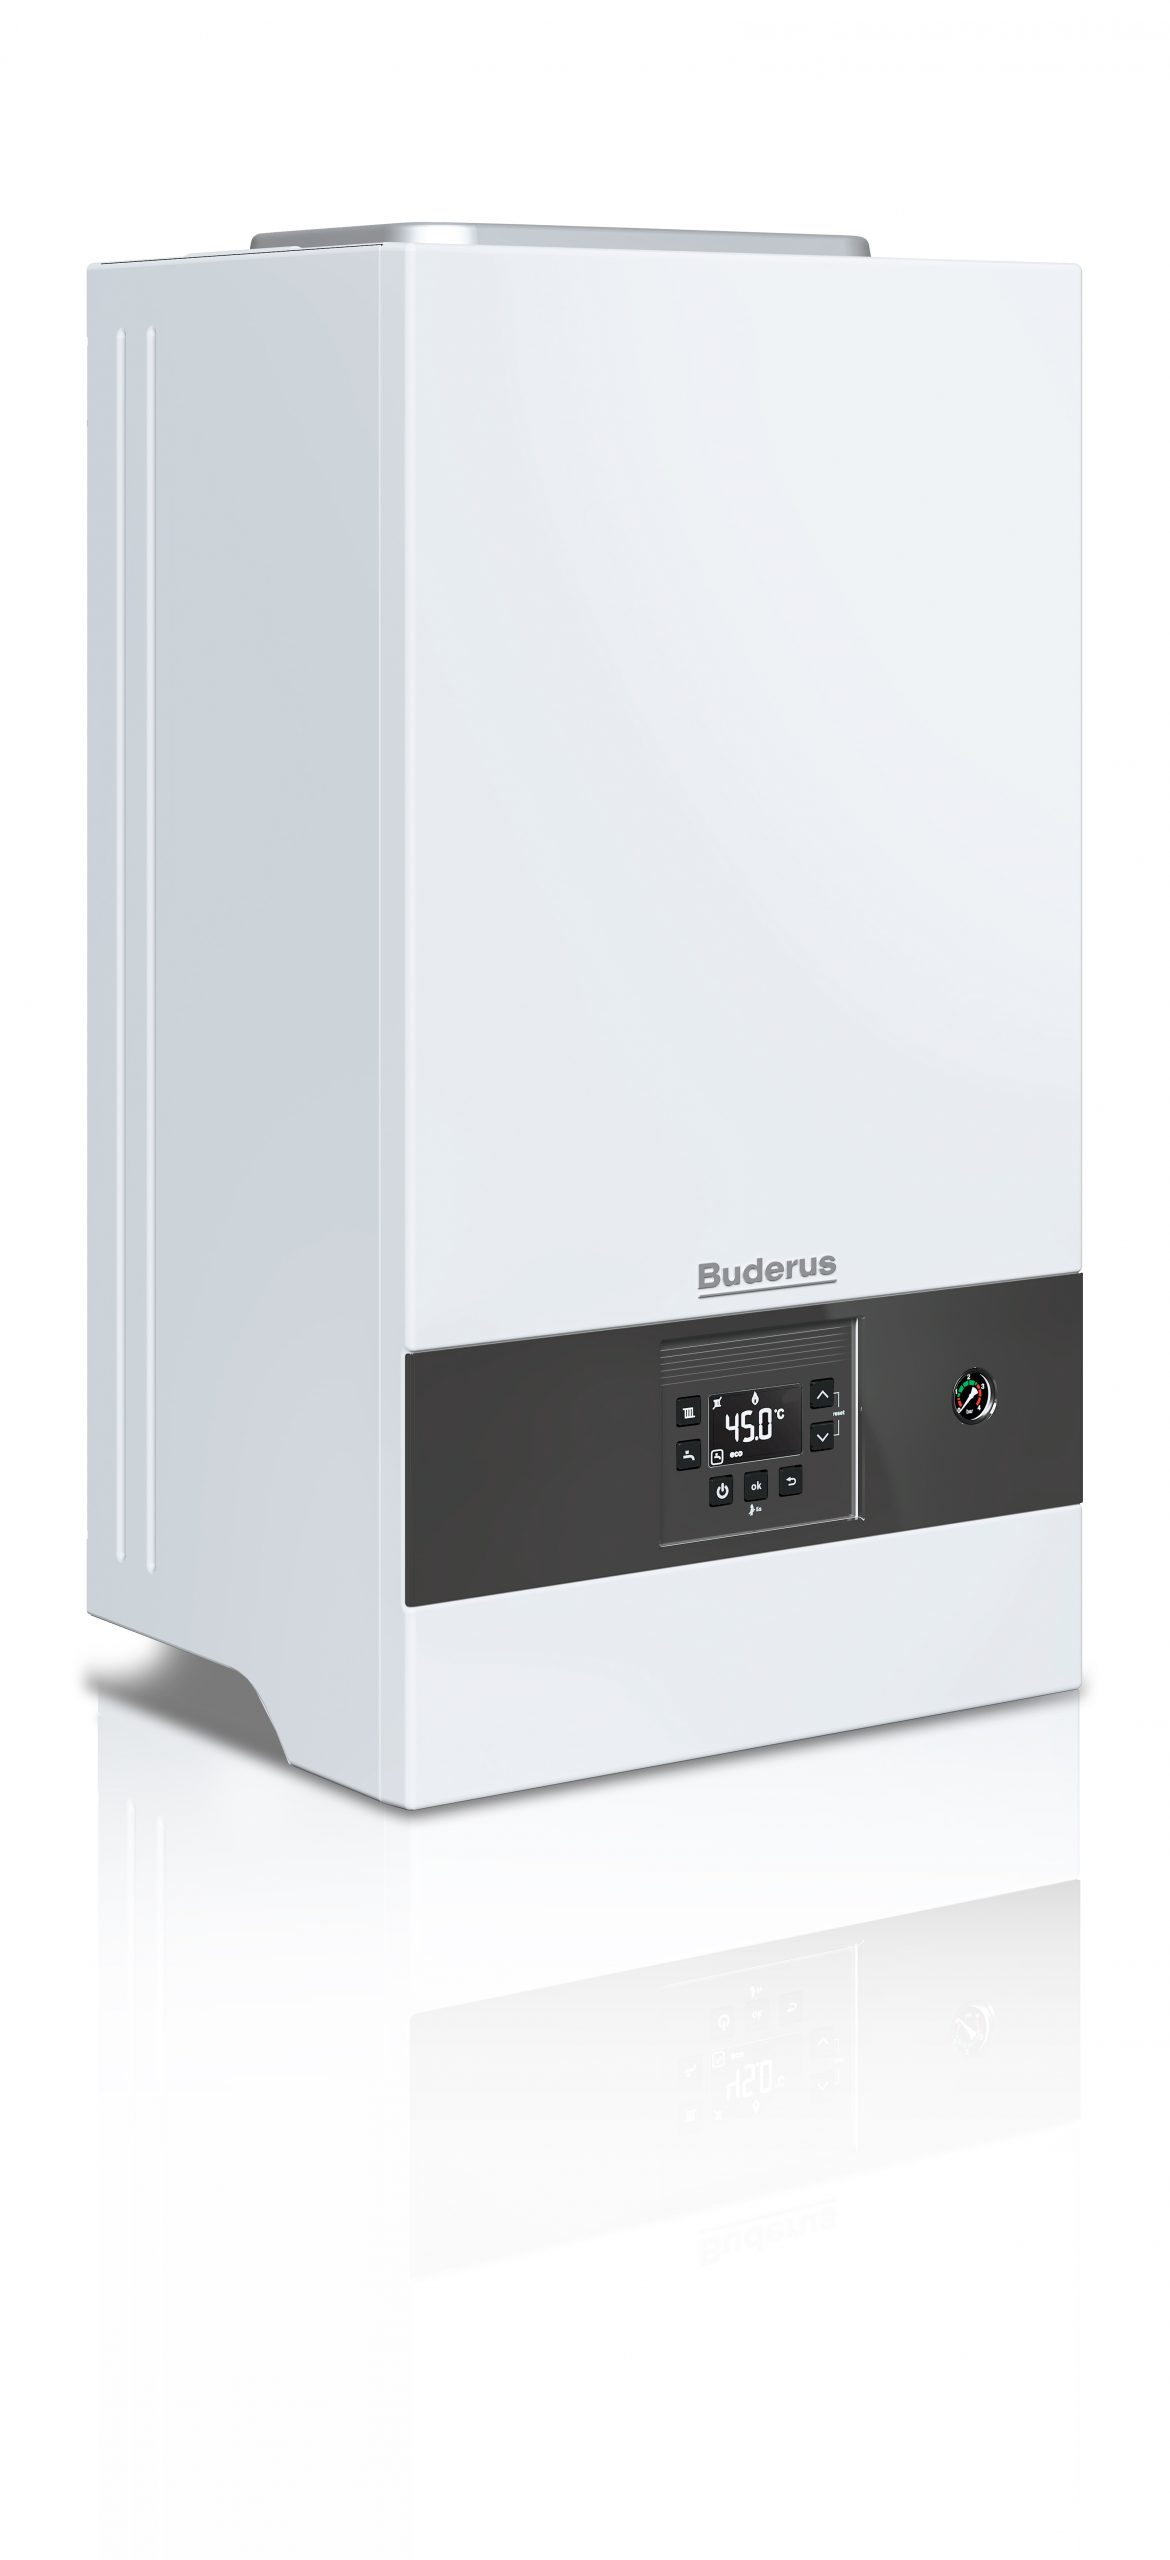 1578905686 Buderus Logamax GB022 scaled